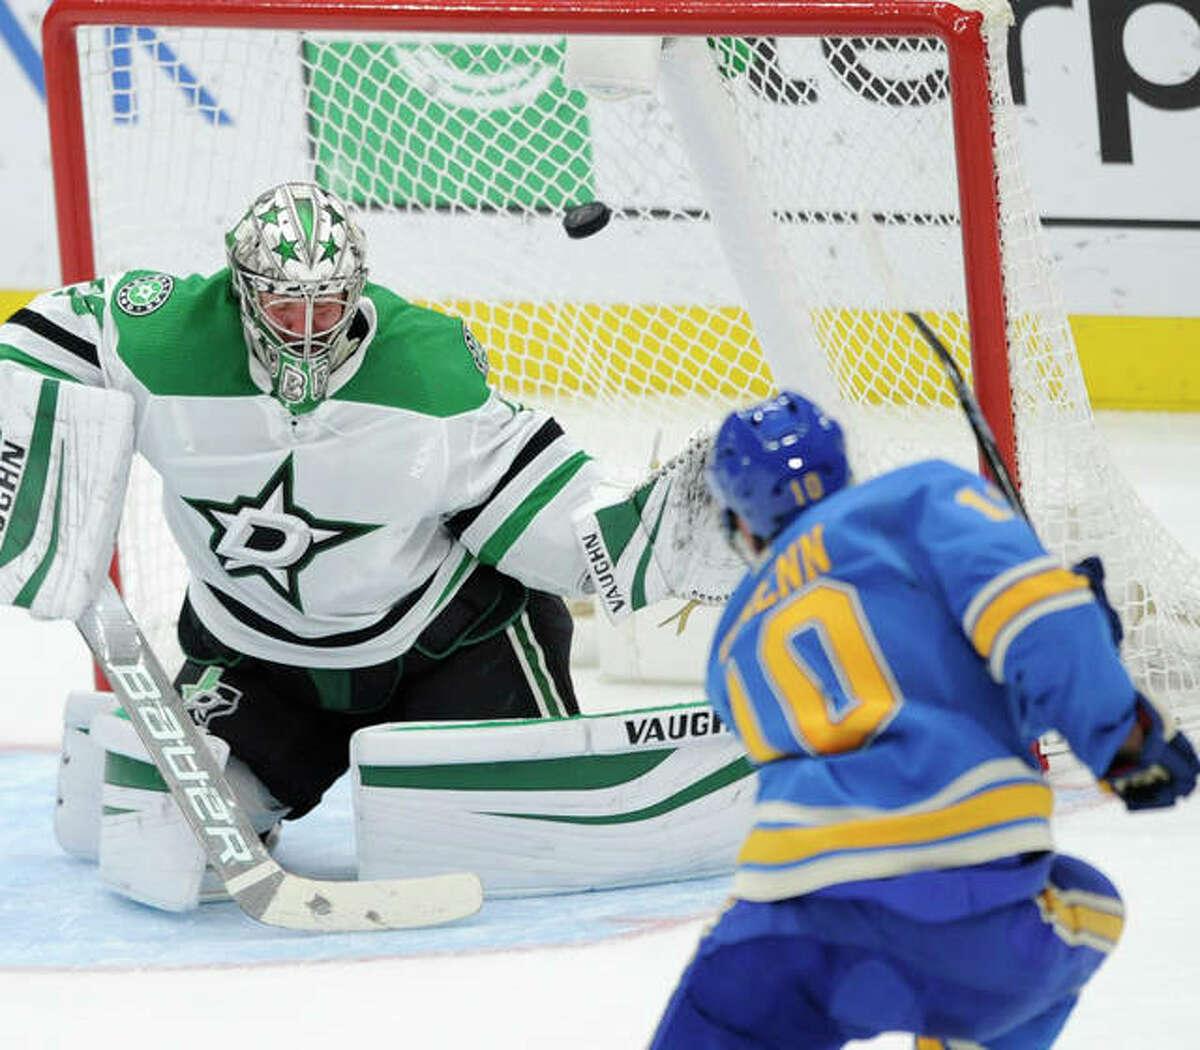 The Blues' Brayden Schenn (10) scores against Stars goalie Anton Khudobin during the second period Saturday night in in St. Louis.